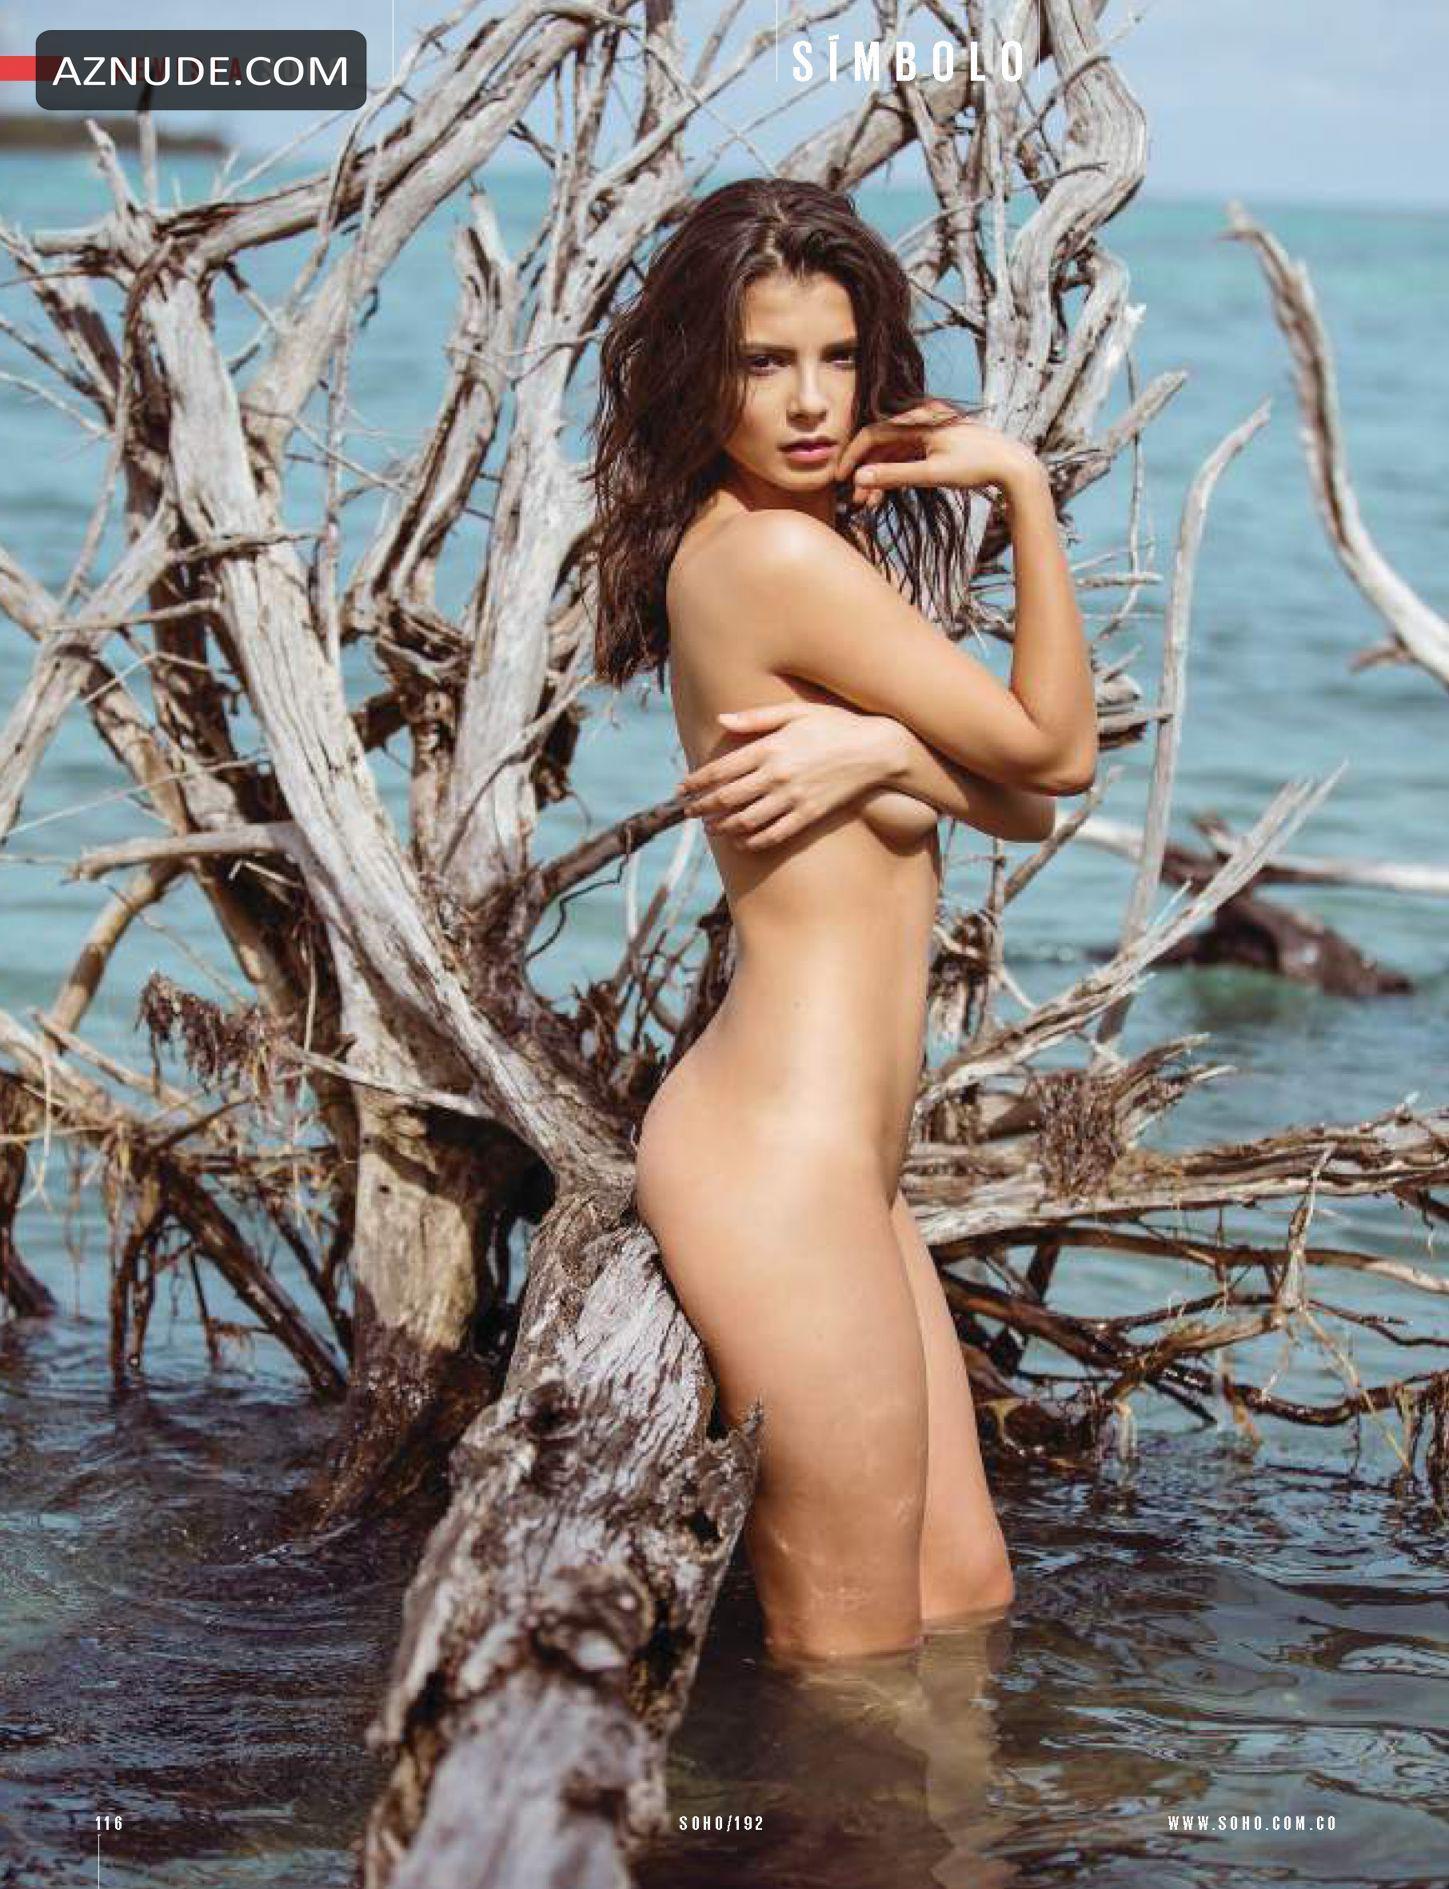 Cato van ee see through 4 pics Porn tube Anastasiya mikulchina,Apple Wang naked. 2018-2019 celebrityes photos leaks!